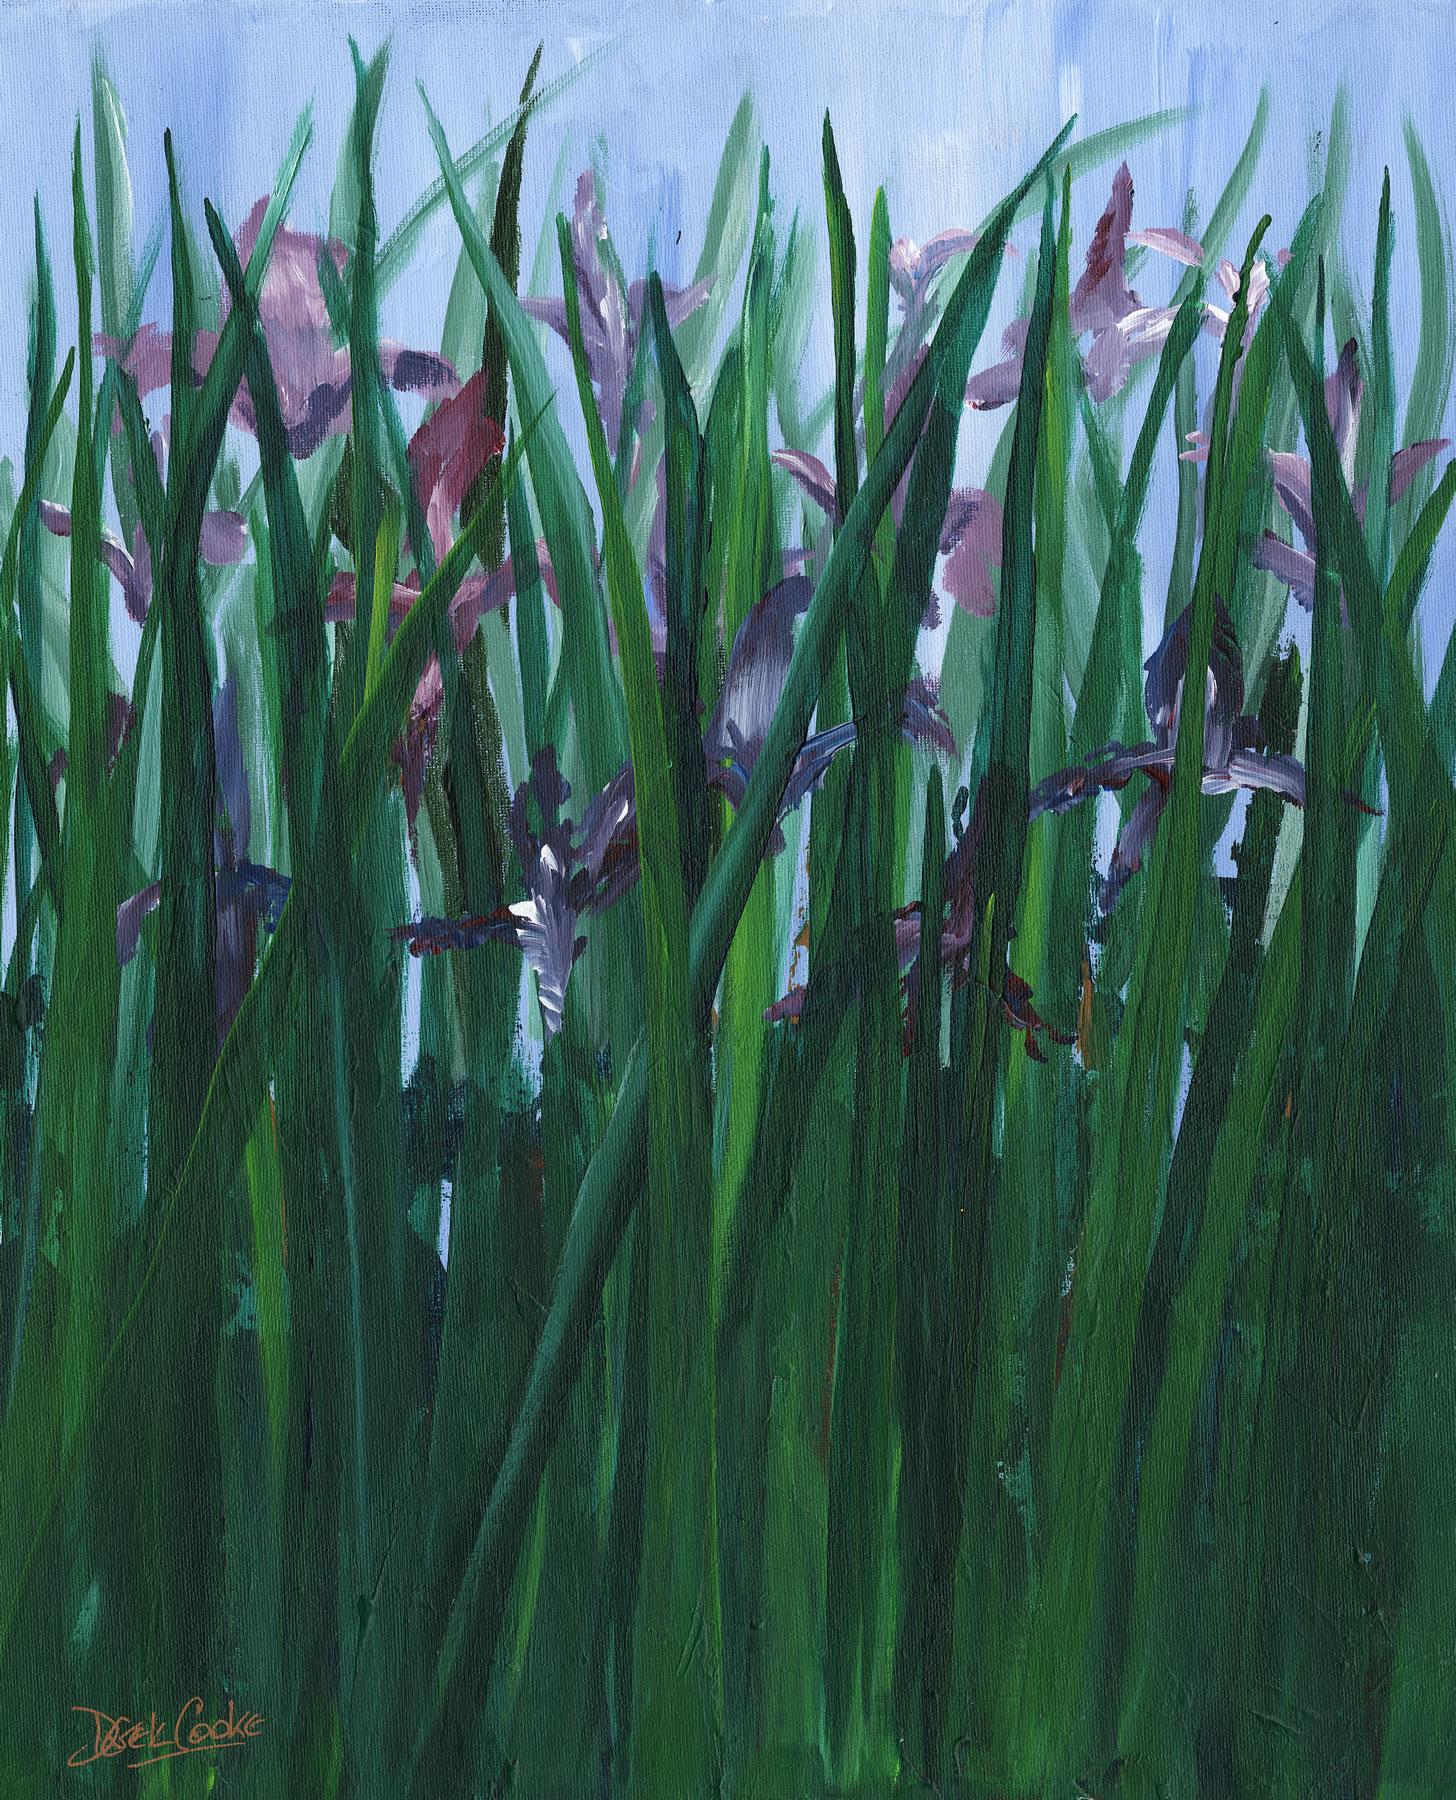 Art Prints Gallery - Purple Irises - Shepperton artist Derek Cooke